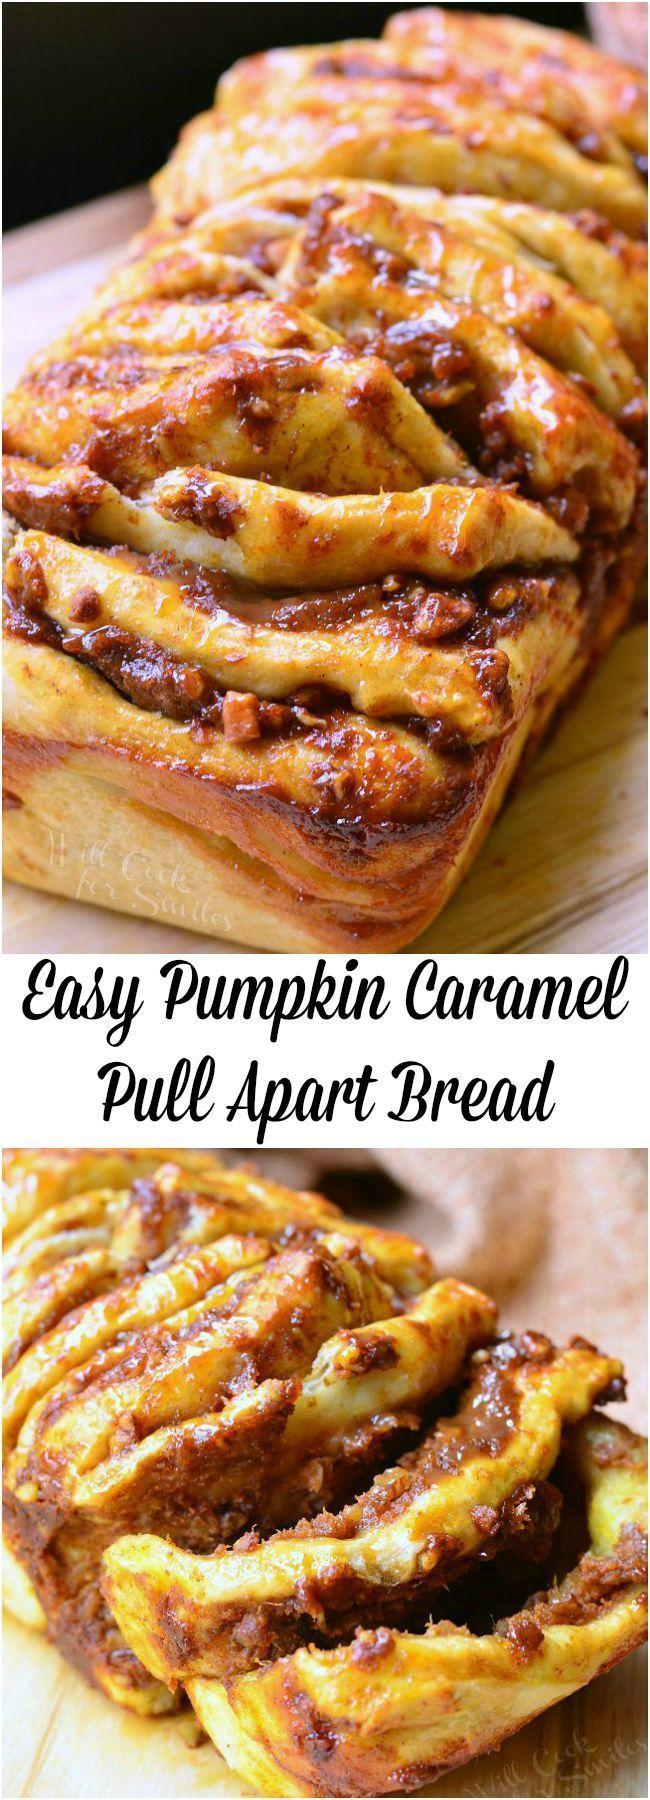 Easy Pumpkin Caramel Pull Apart Bread and The Pumpkin Lovers Cookbook